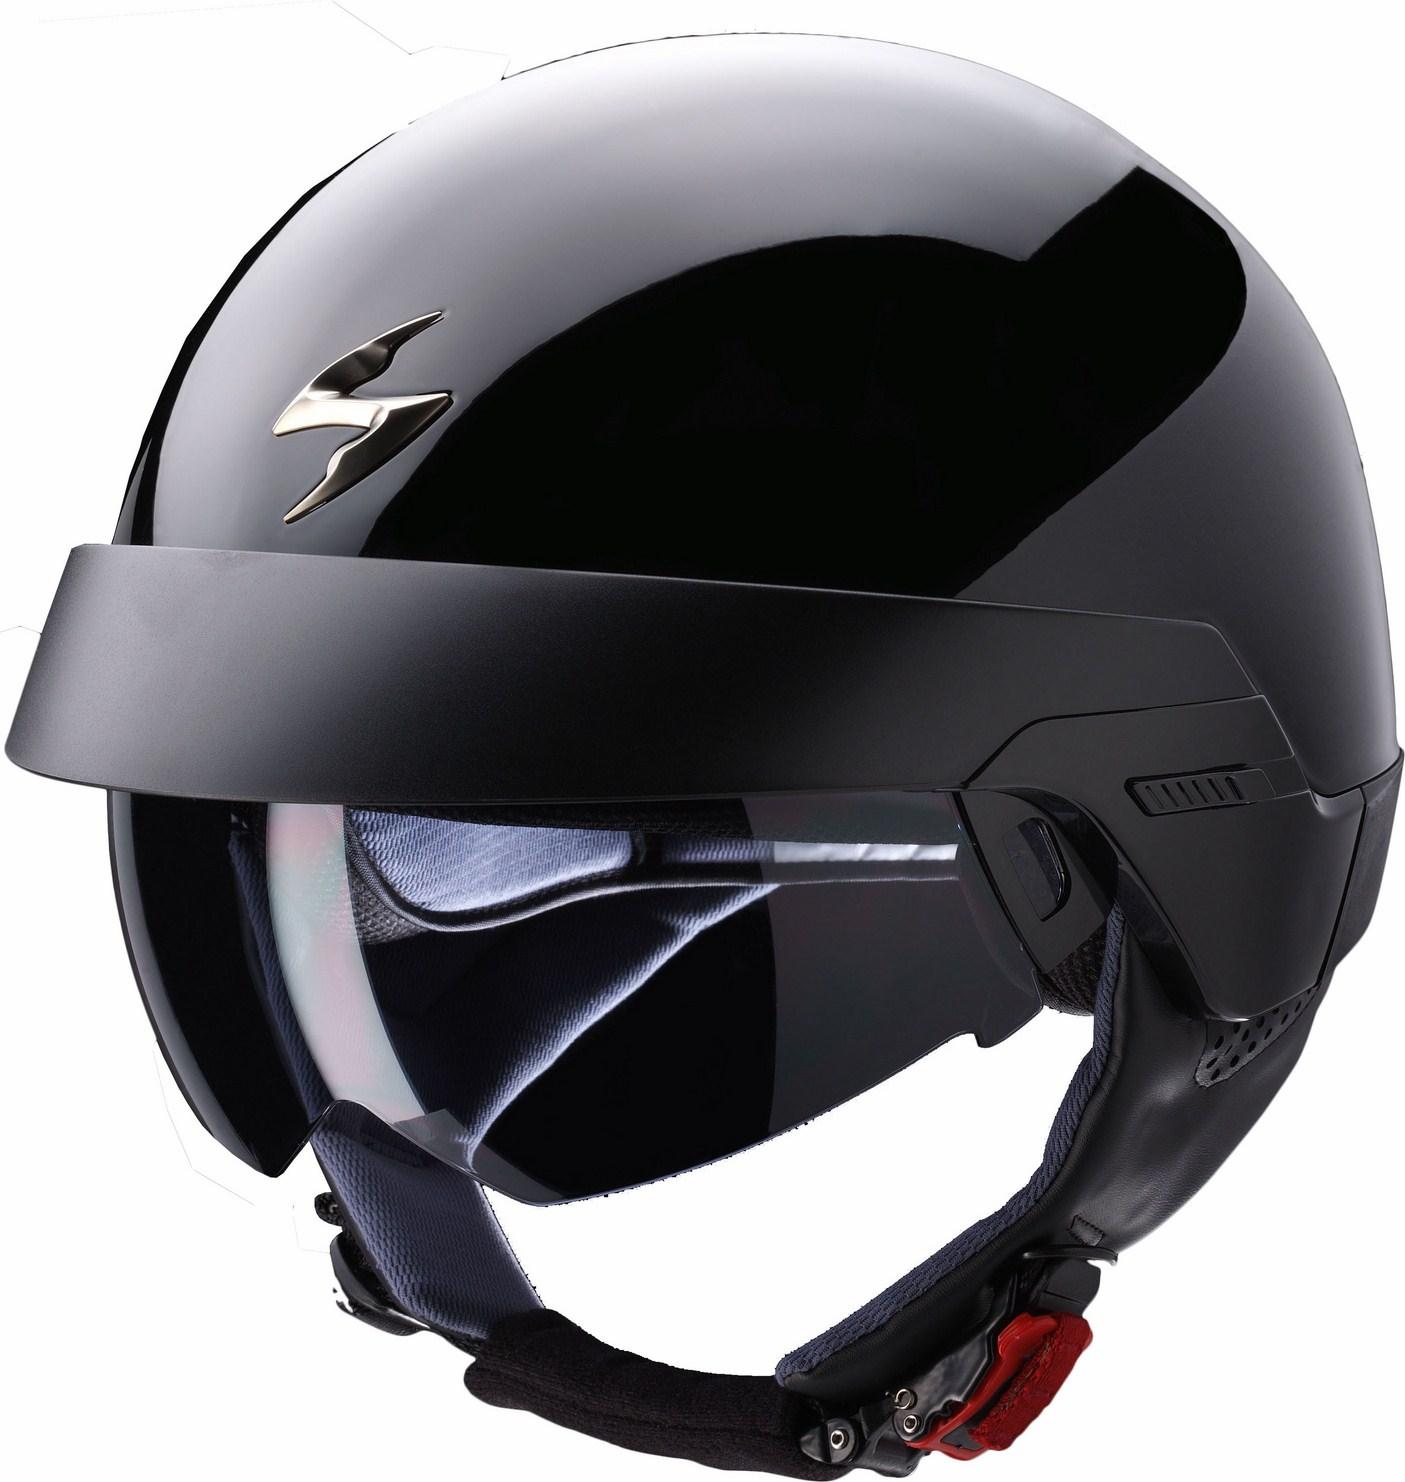 Casco jet Scorpion Exo 100 nero lucido